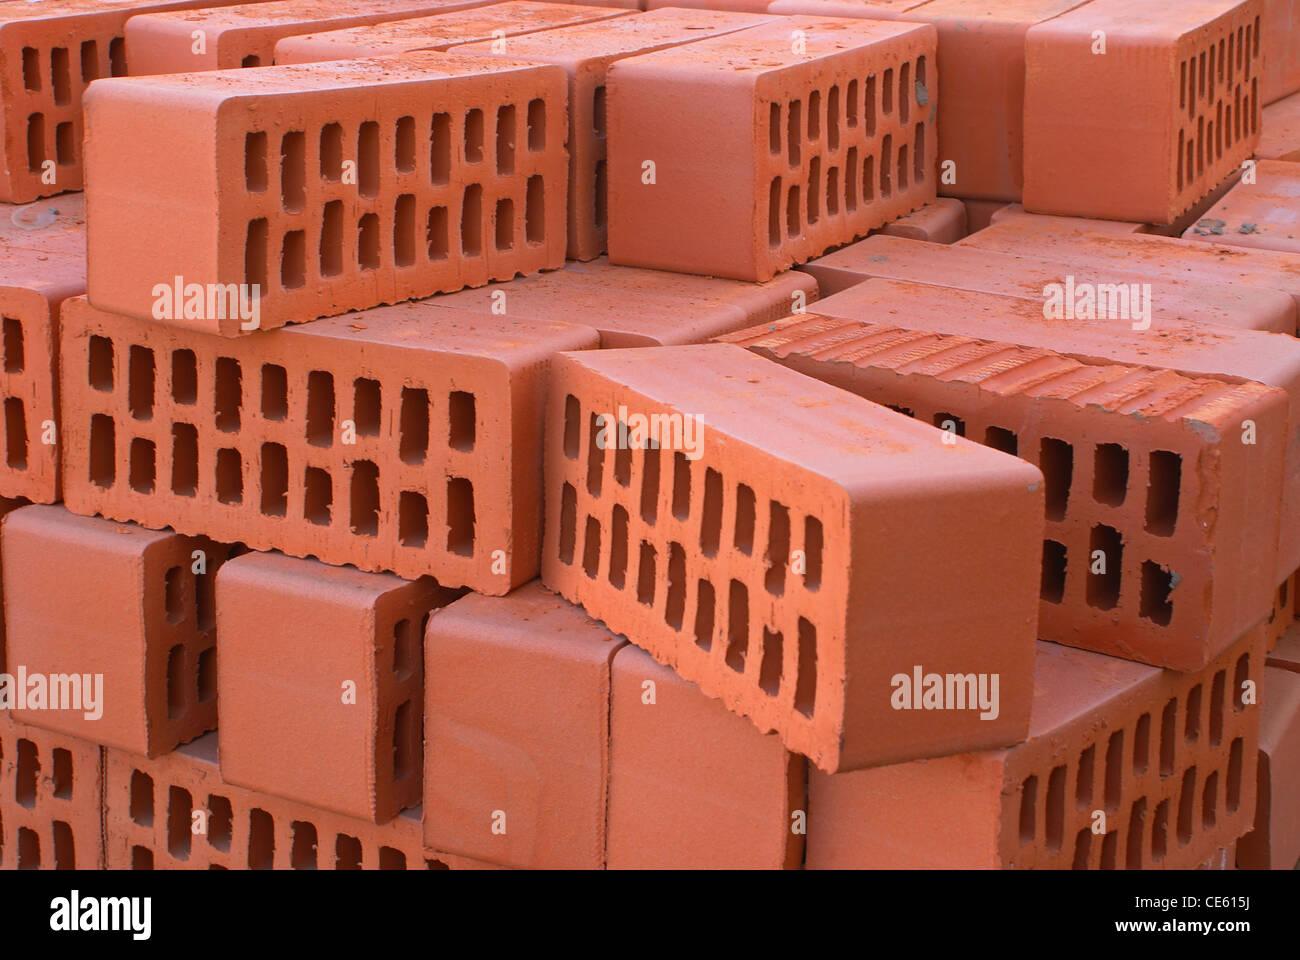 Red bricks. - Stock Image